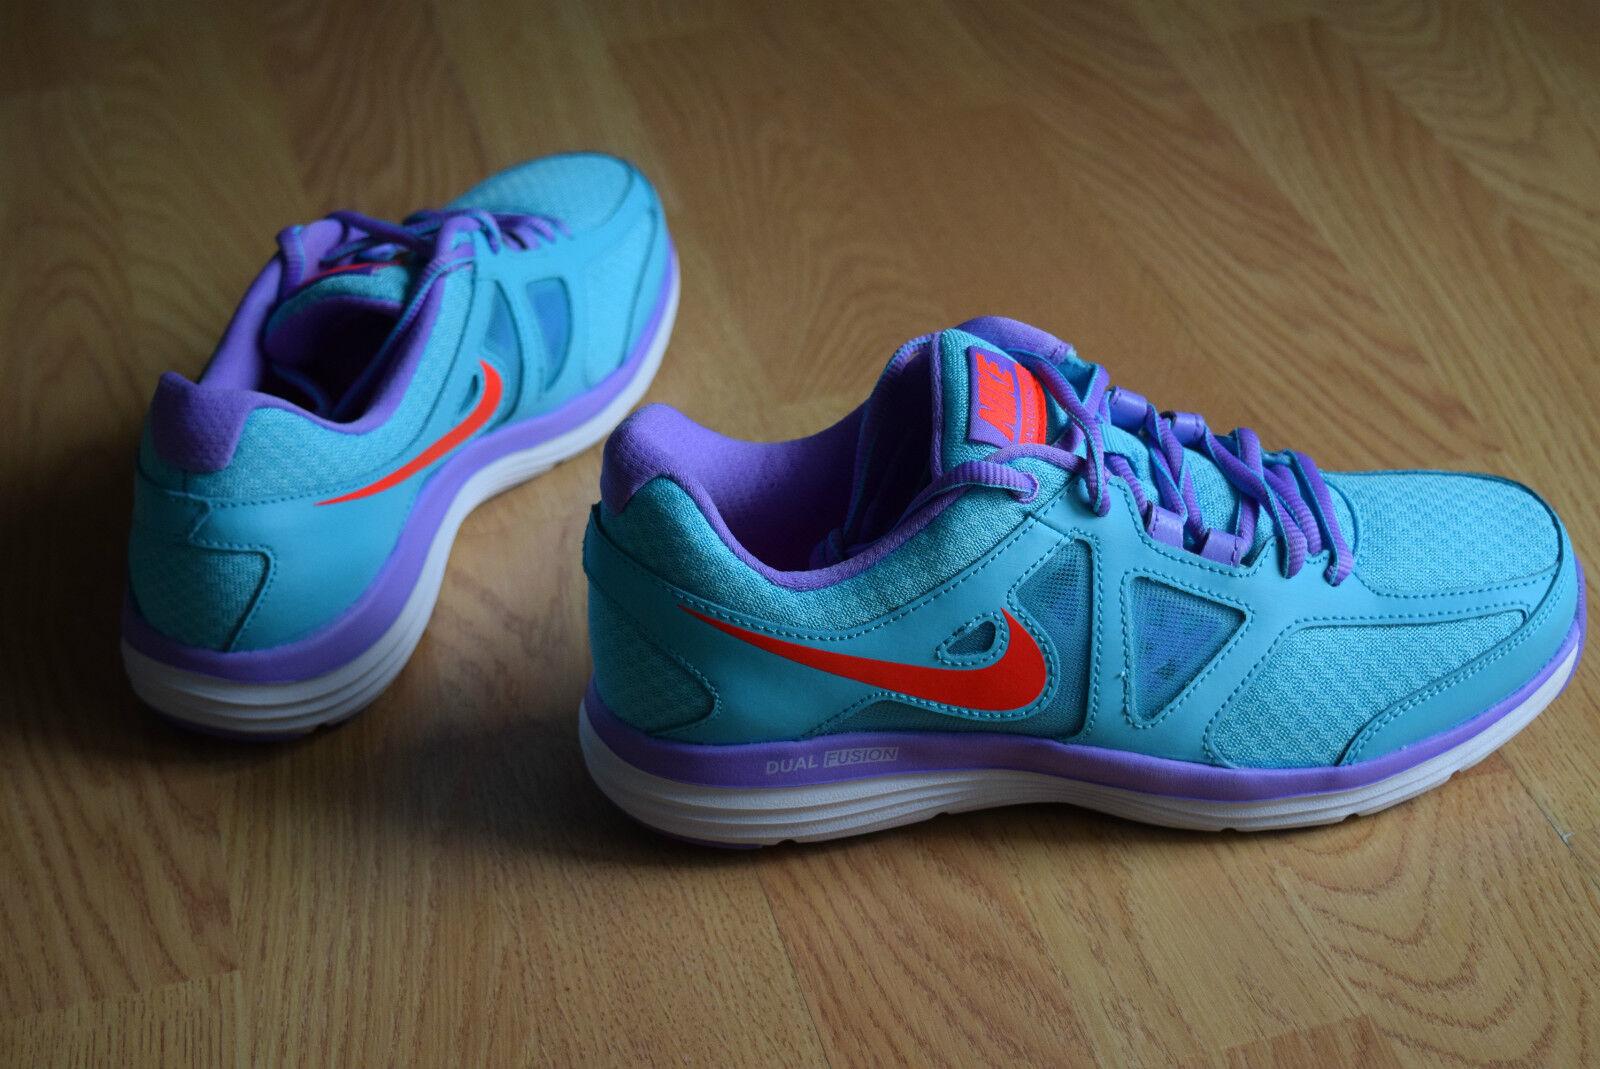 Nike WMNS DUAL FUSION LITE 2 gr 38 38,5 39 Free Trainer Light Flex Lunar